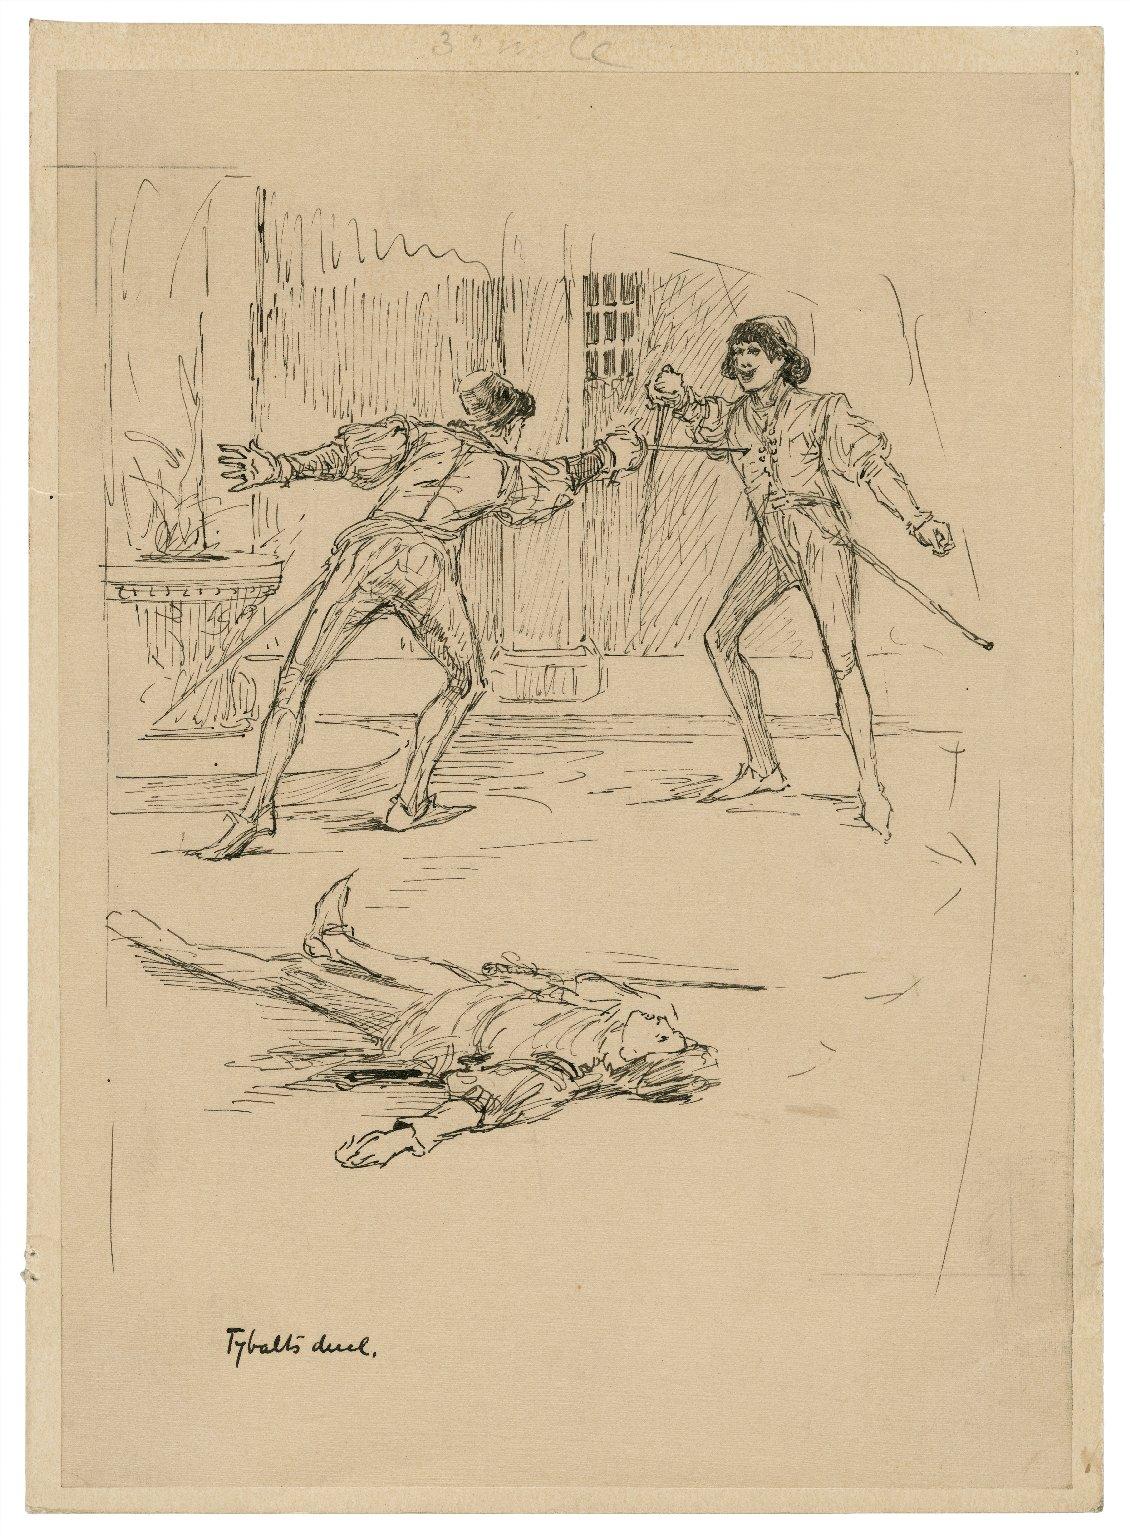 Tybalt's duel [graphic] / [Louis Rhead].